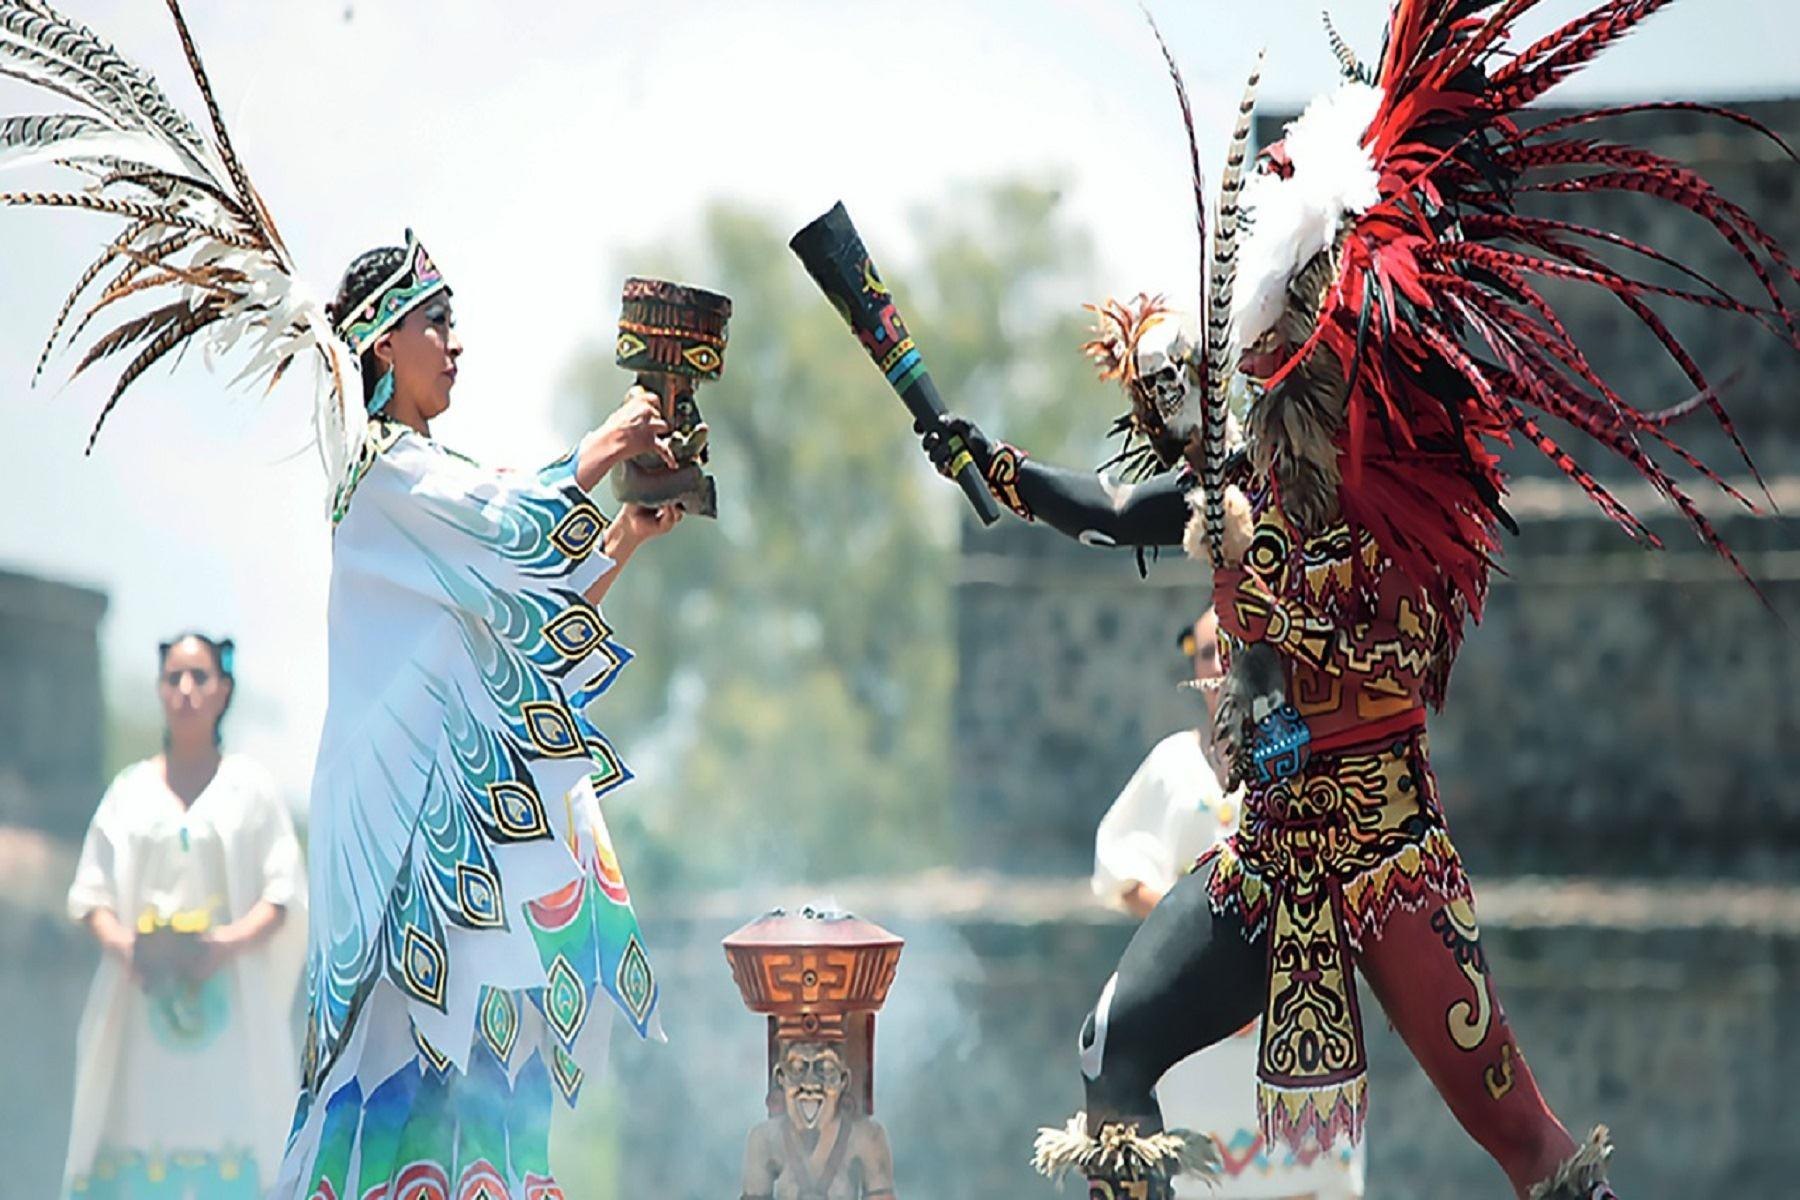 Presidente peruano recibe Antorcha Panamericana_Spanish — Juegos Panamericanos